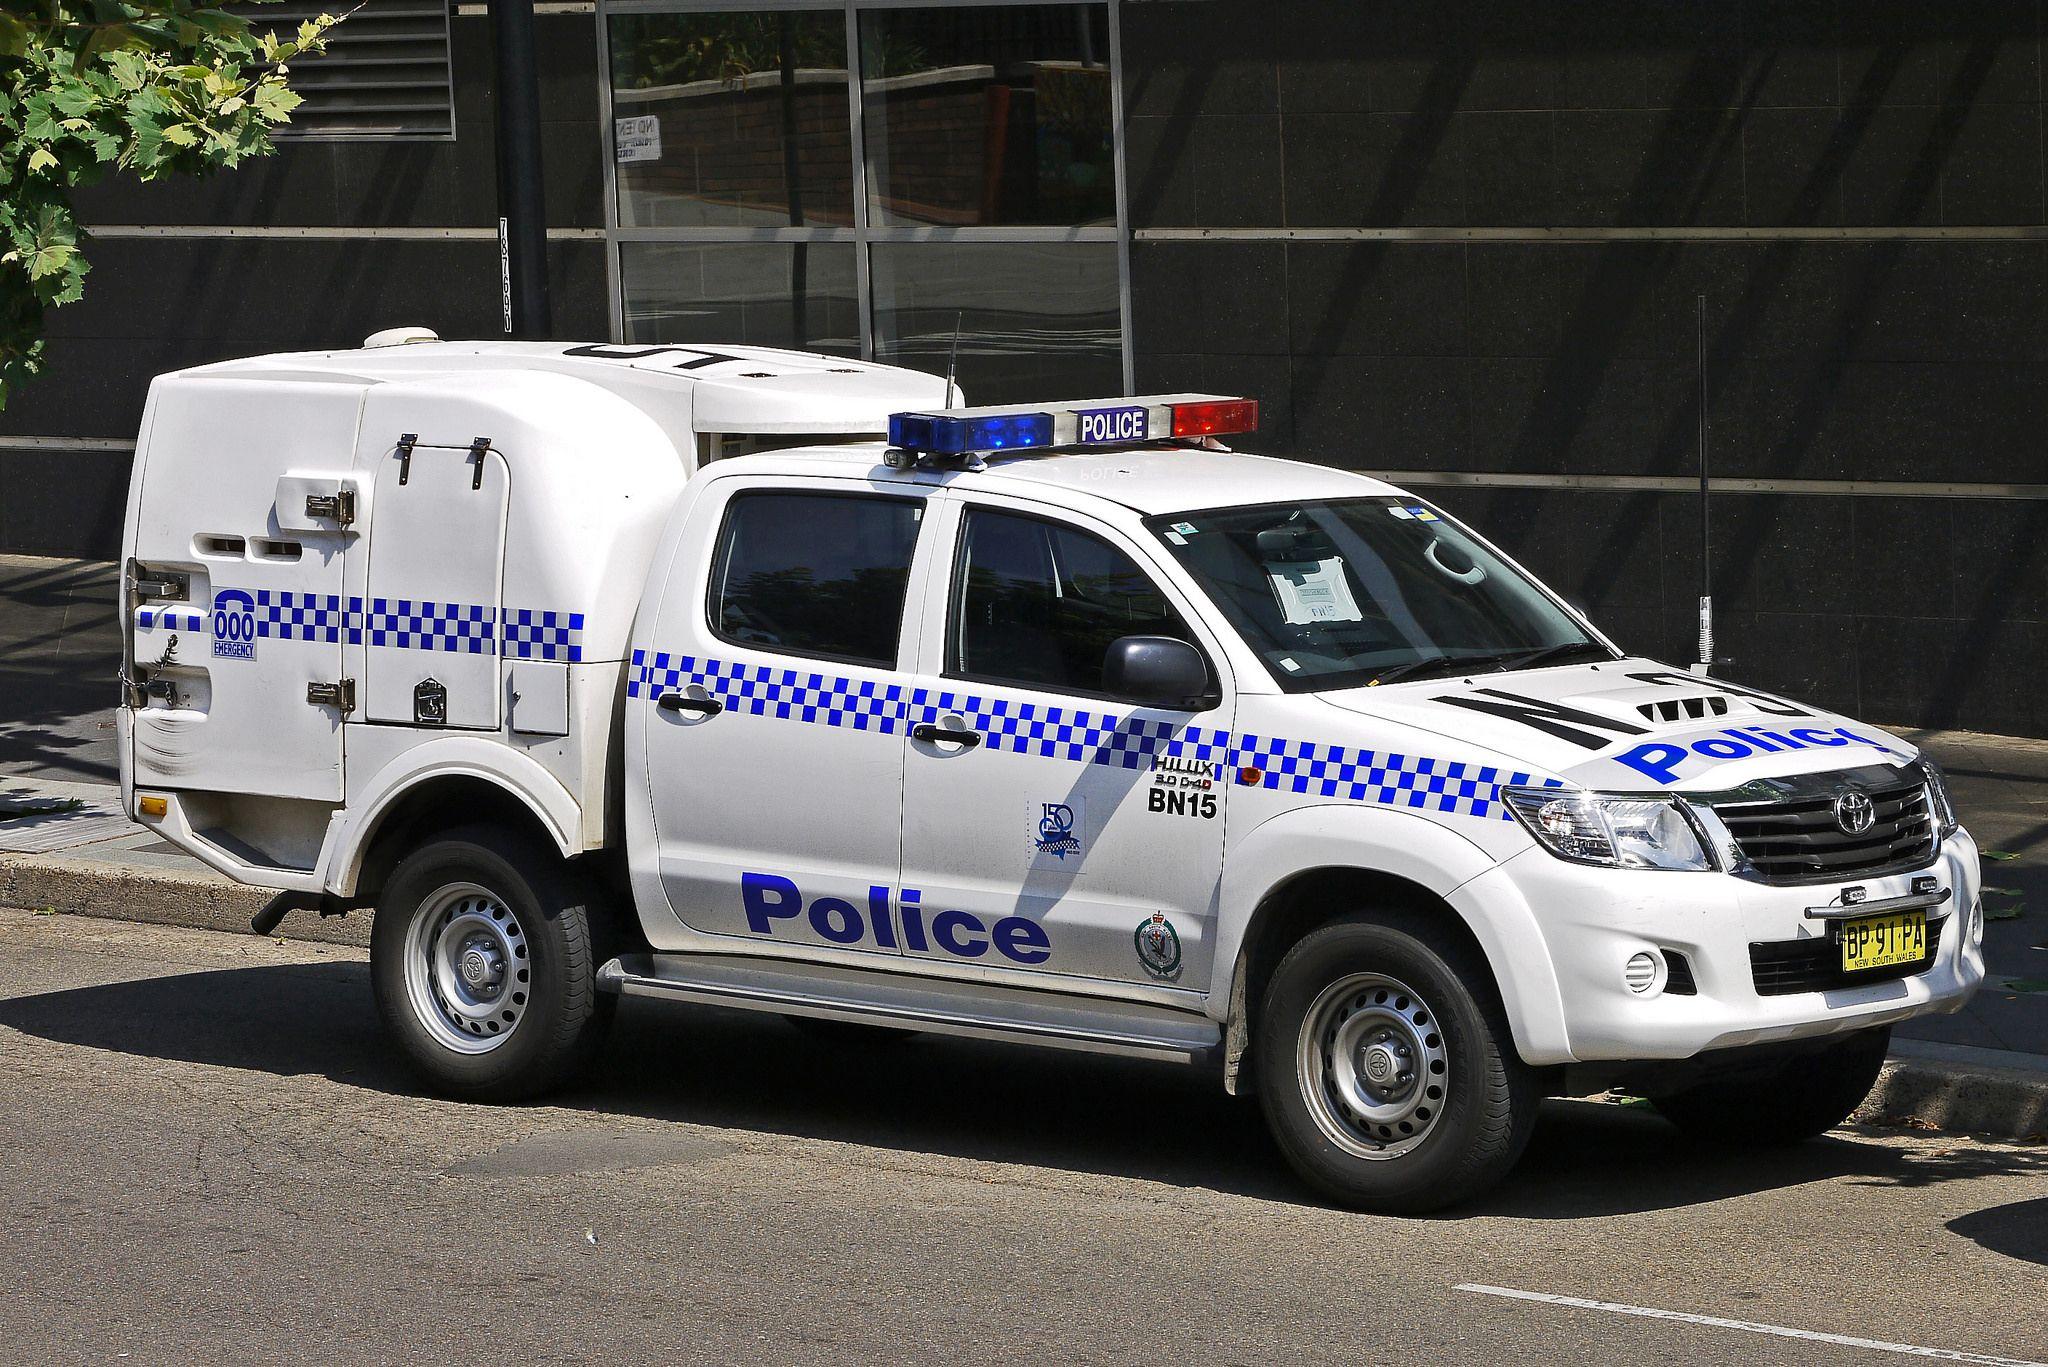 https://flic.kr/p/KRQHtU   NSW Police Police van